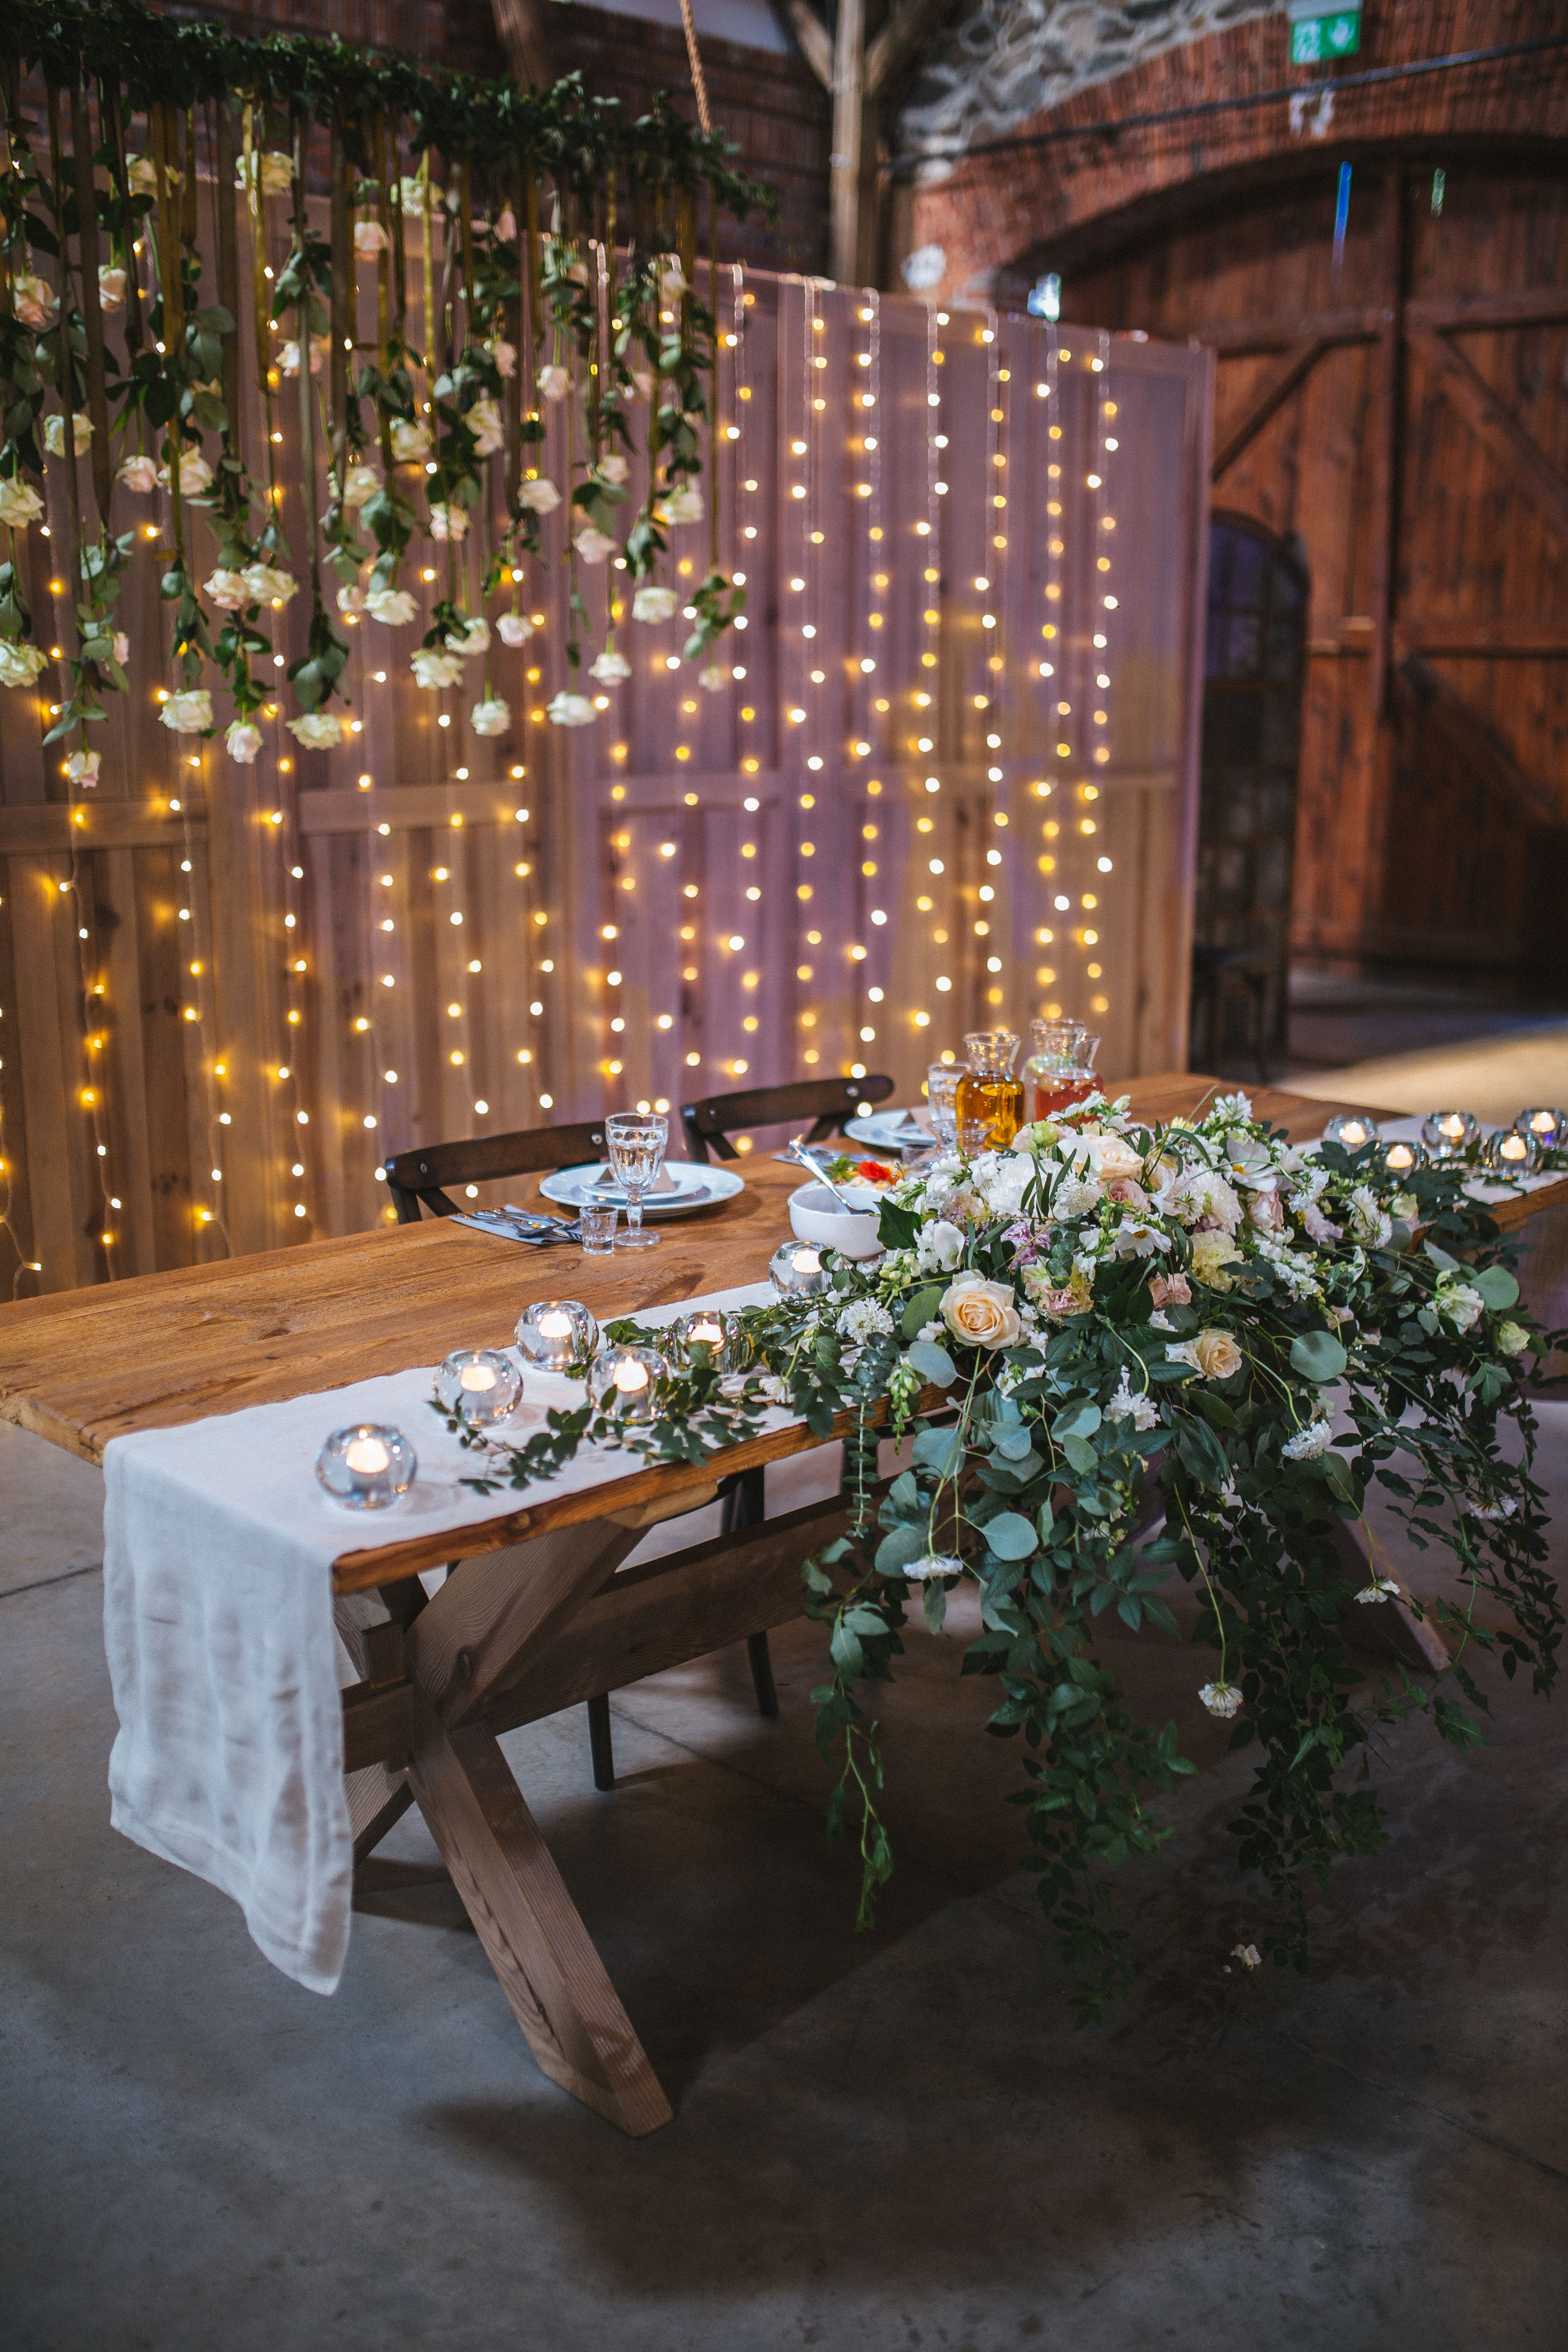 Inna Studio Pastel Wedding Composition With Eucalyptus Bride And Groom Table D Bride Groom Table Decoration Bride Groom Table Backdrop Brides Table Decorations